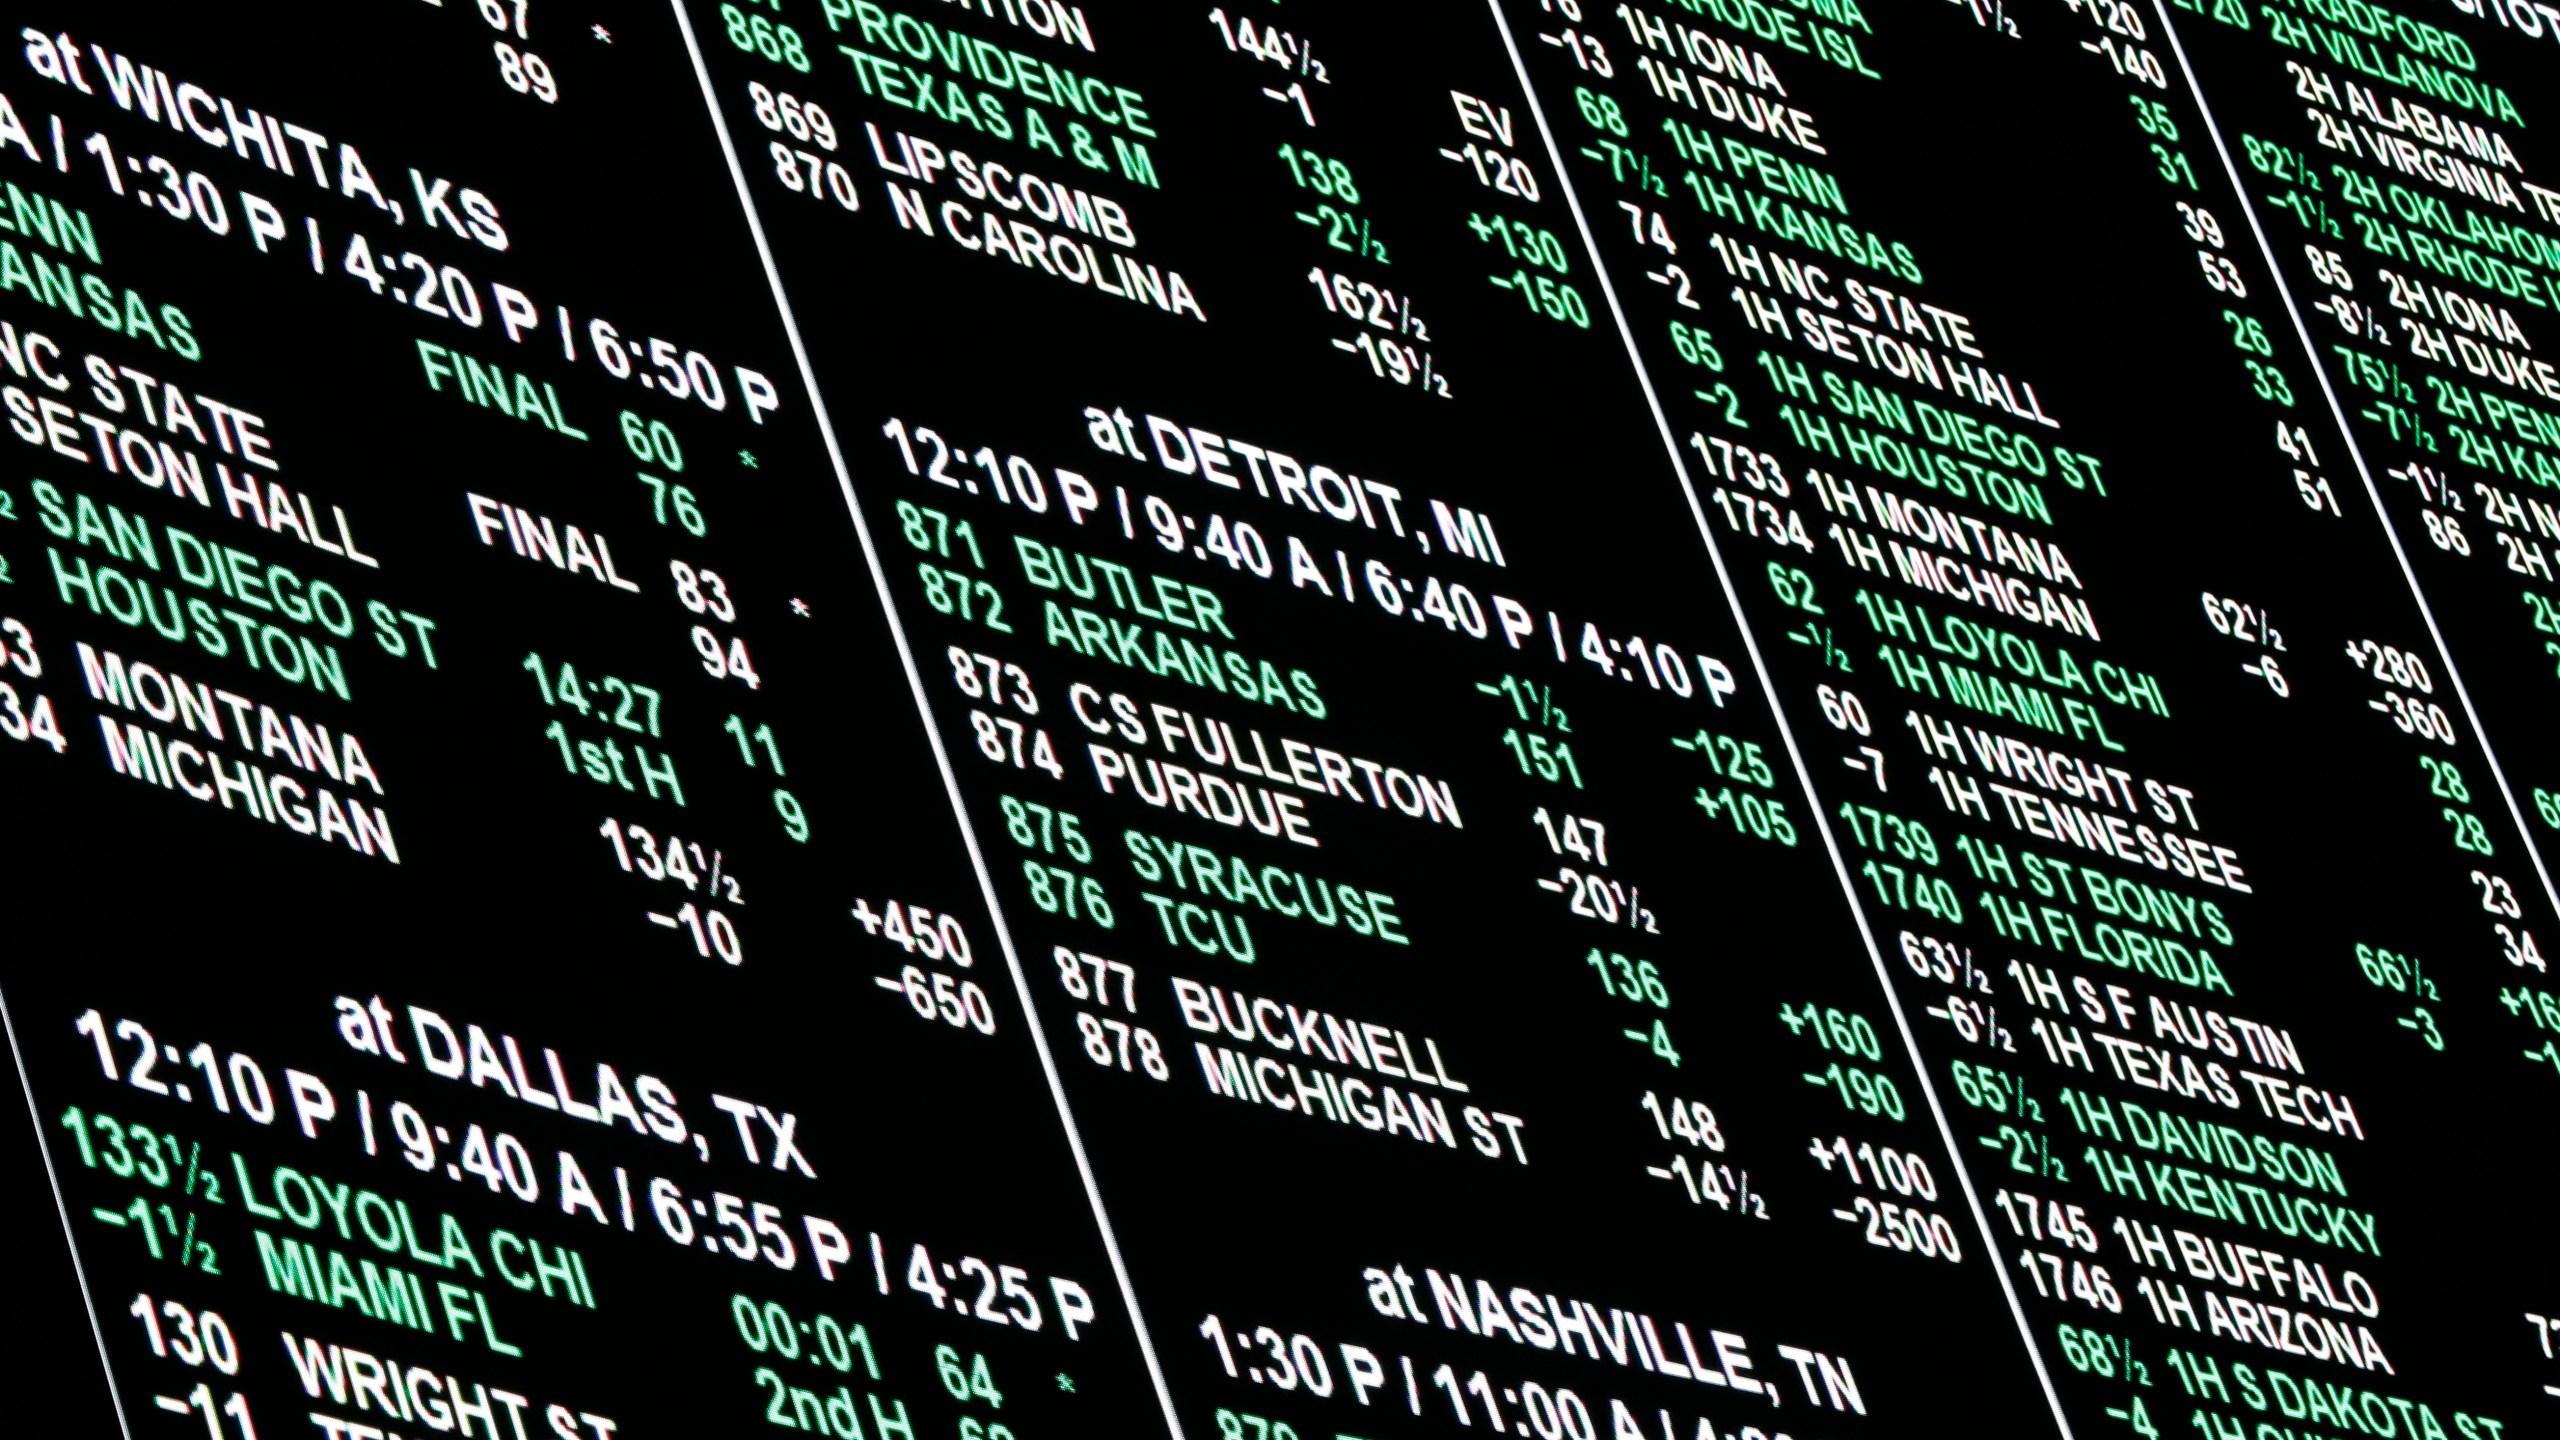 Ncaa betting line las vegas pot limit omaha pre flop betting chart